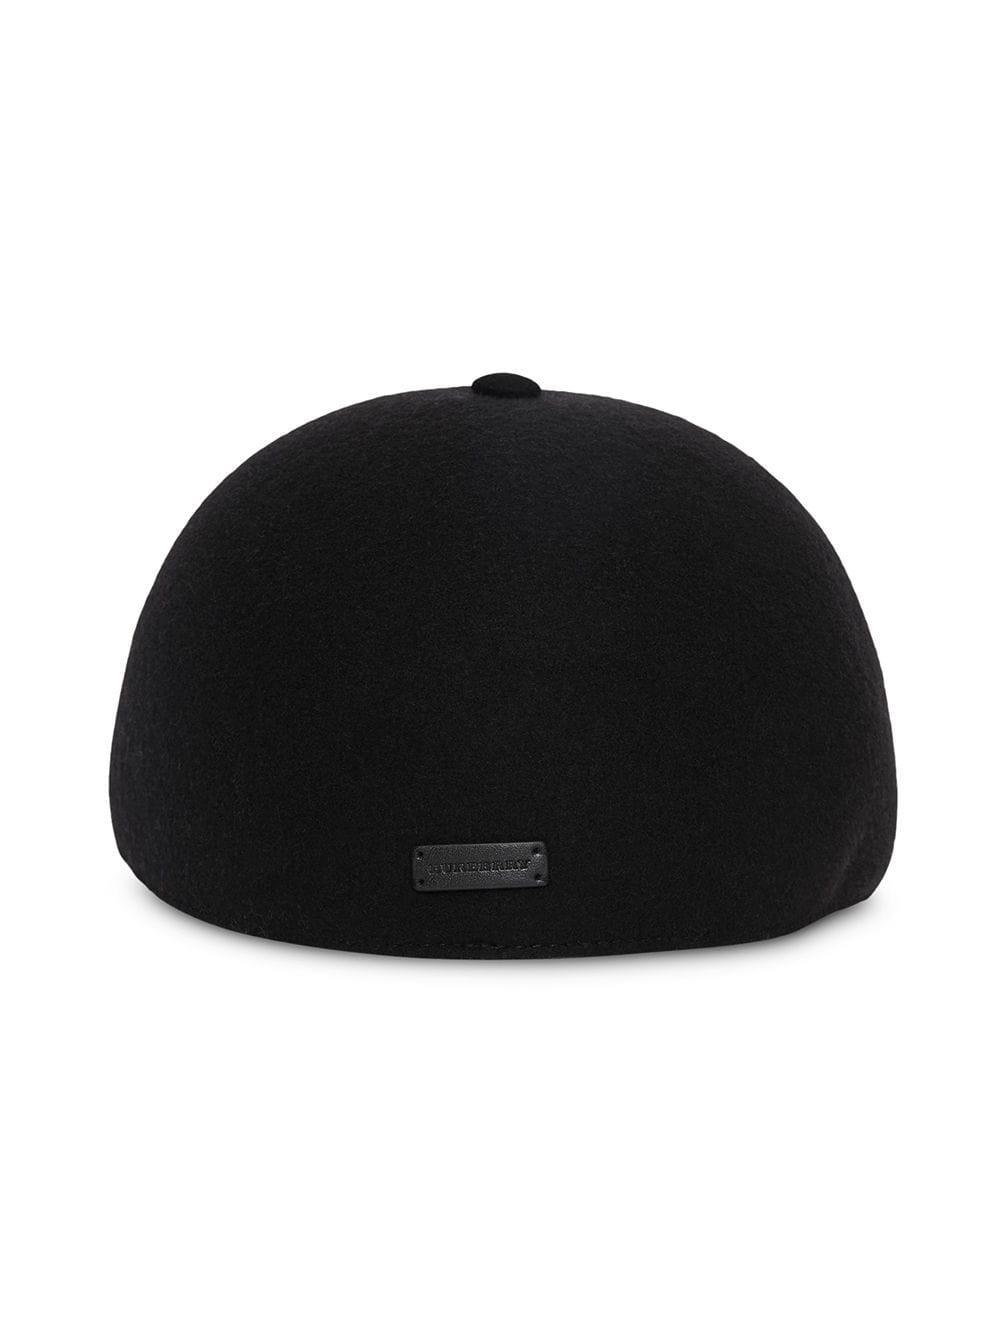 b42b469747c Burberry - Black Felted Wool Baseball Cap - Lyst. View fullscreen